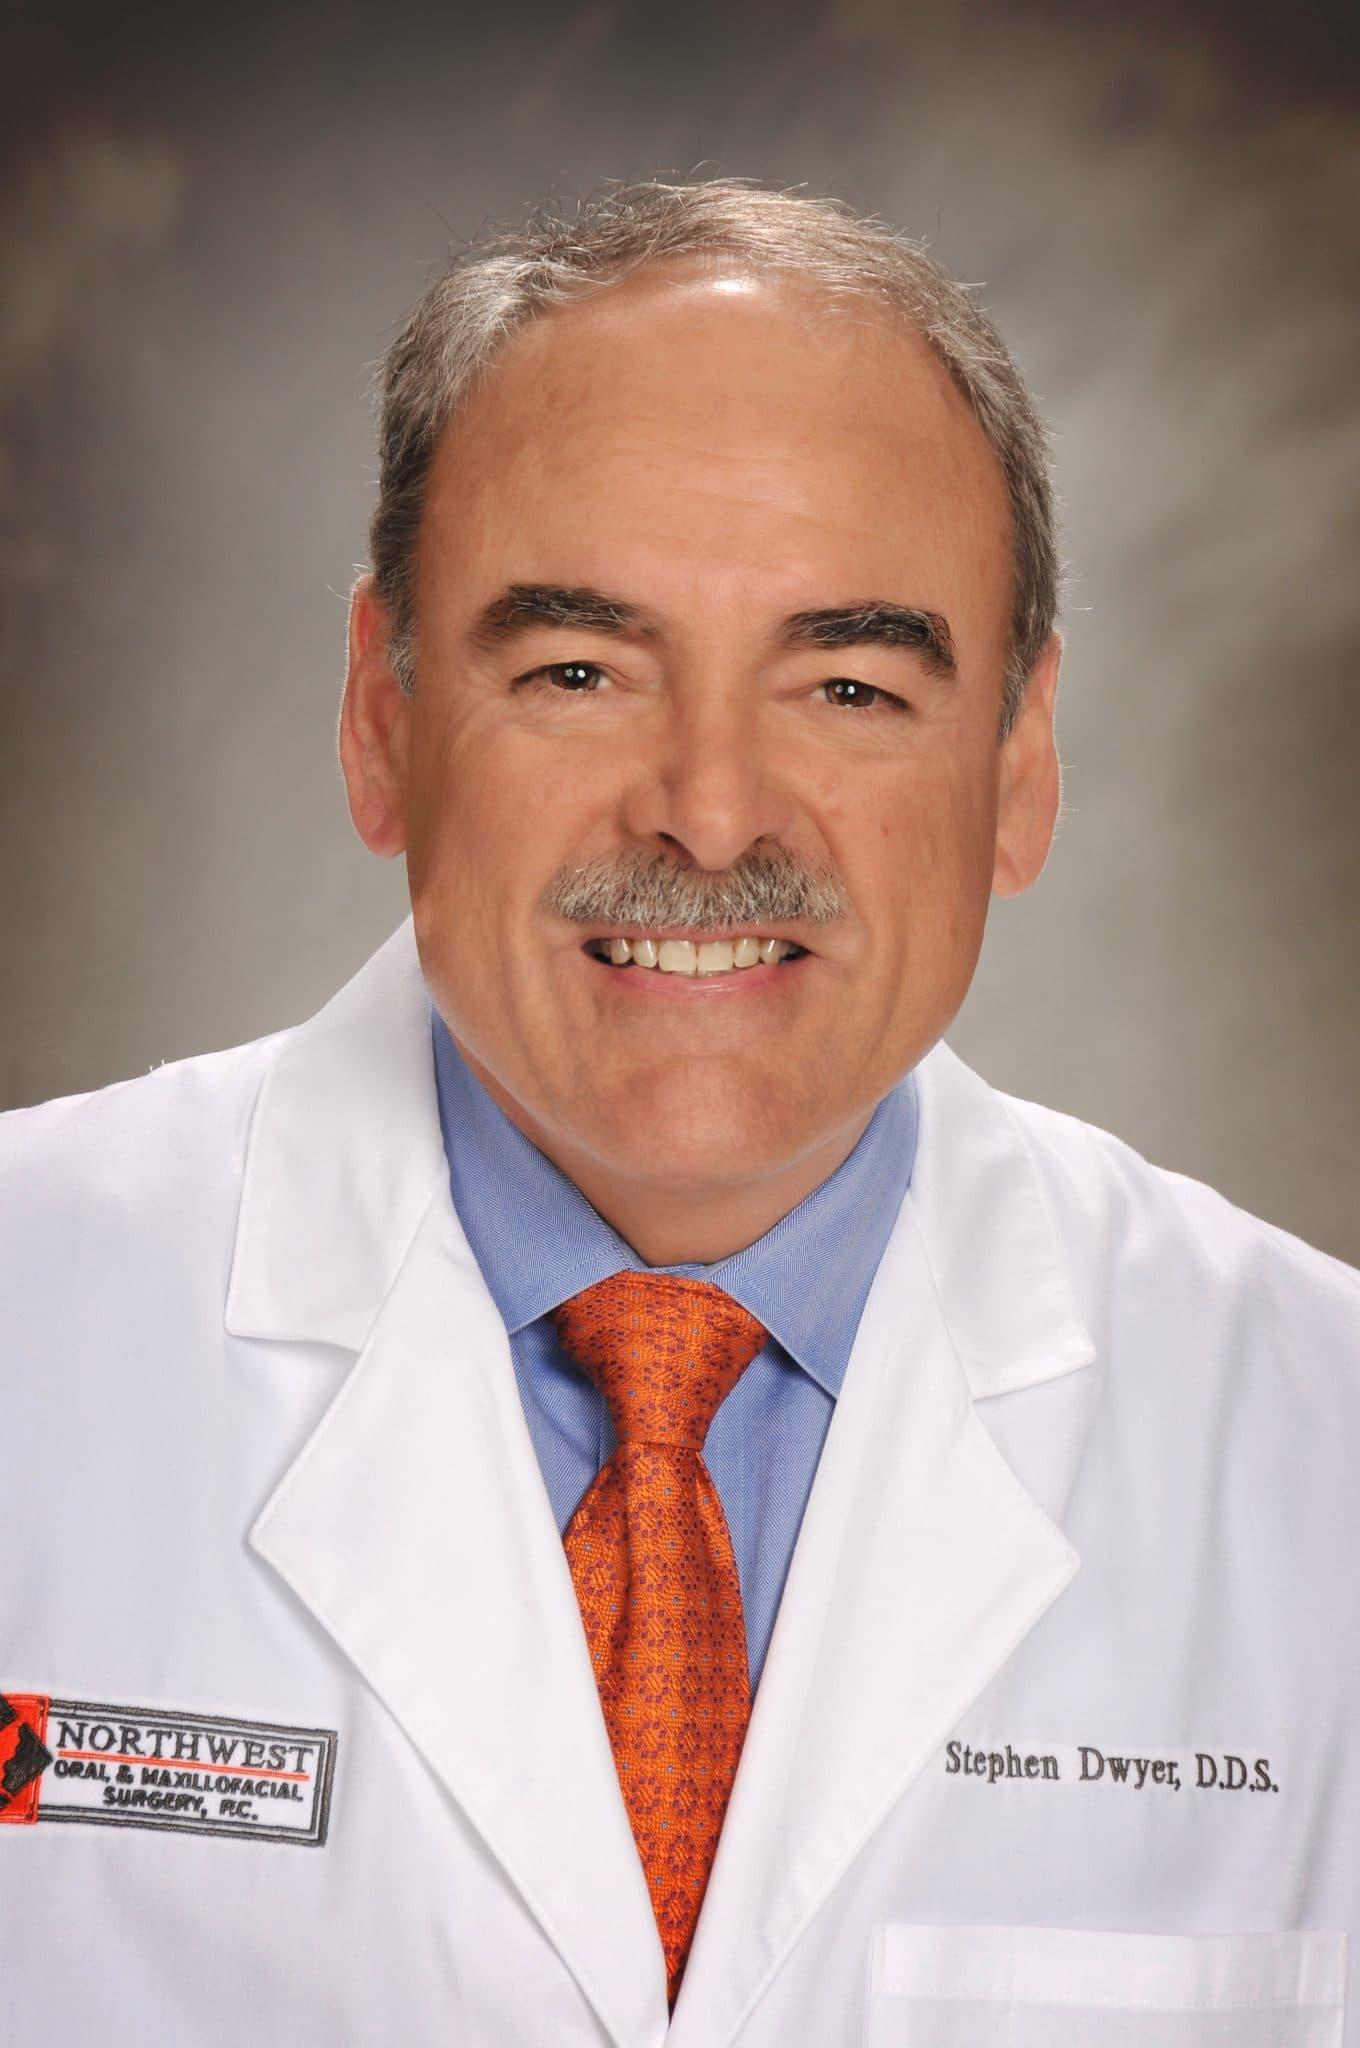 Dr Stephen Dwyer - Northwest Oral & Maxillofacial Surgery